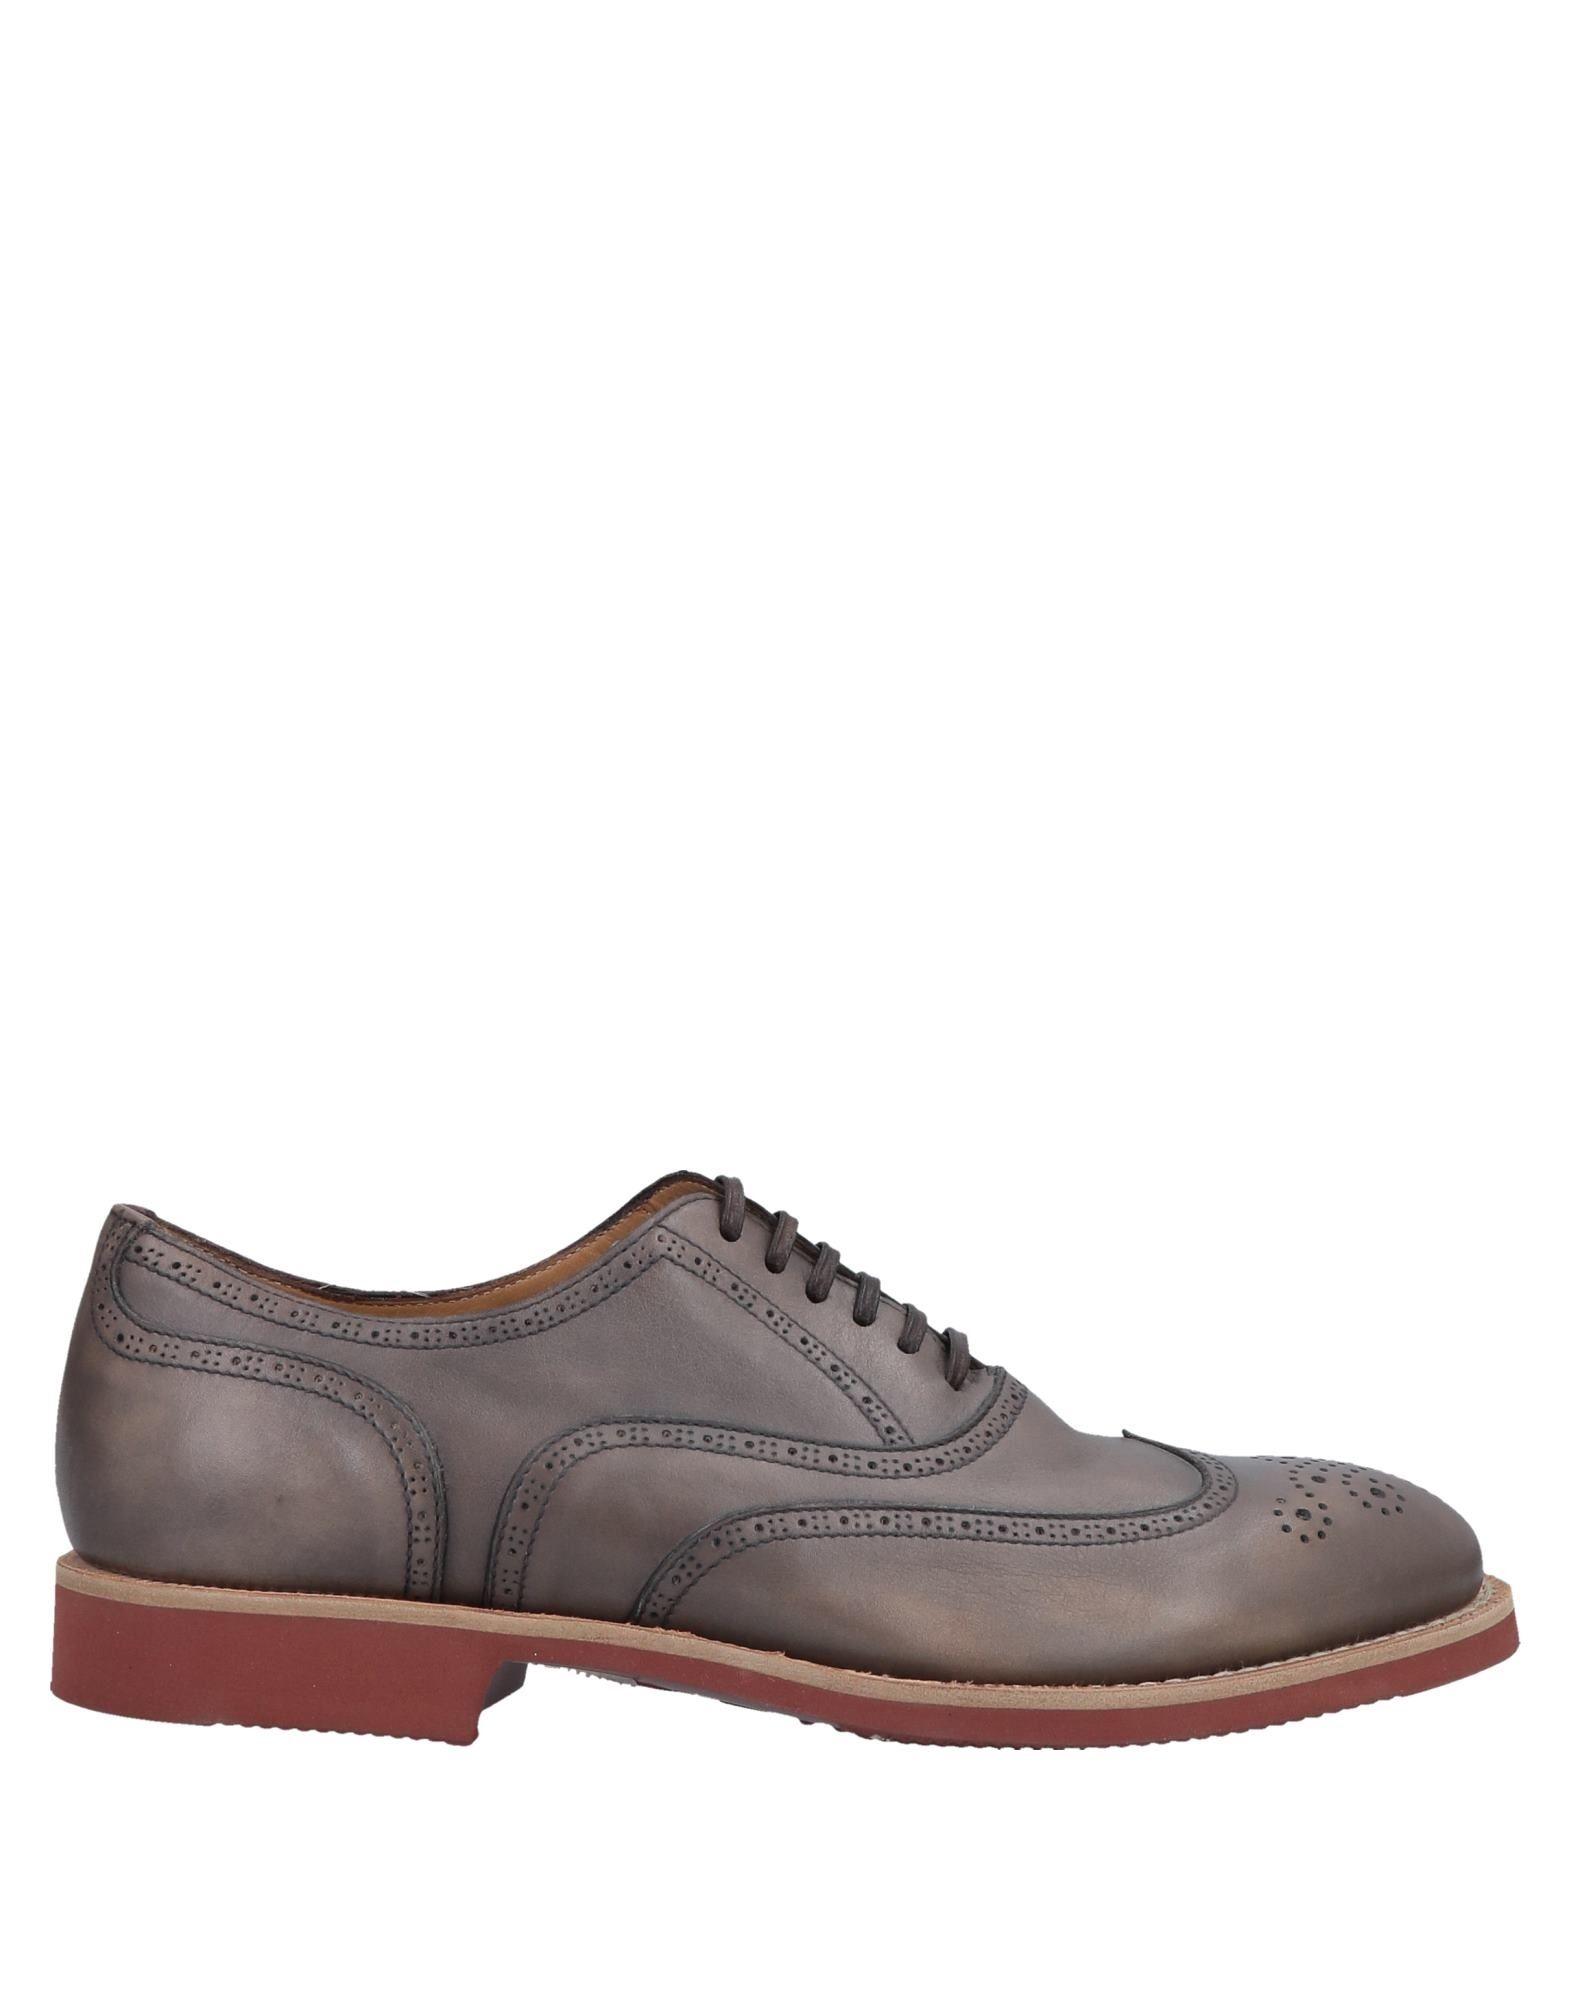 BARRETT Обувь на шнурках обувь 2015 тренды